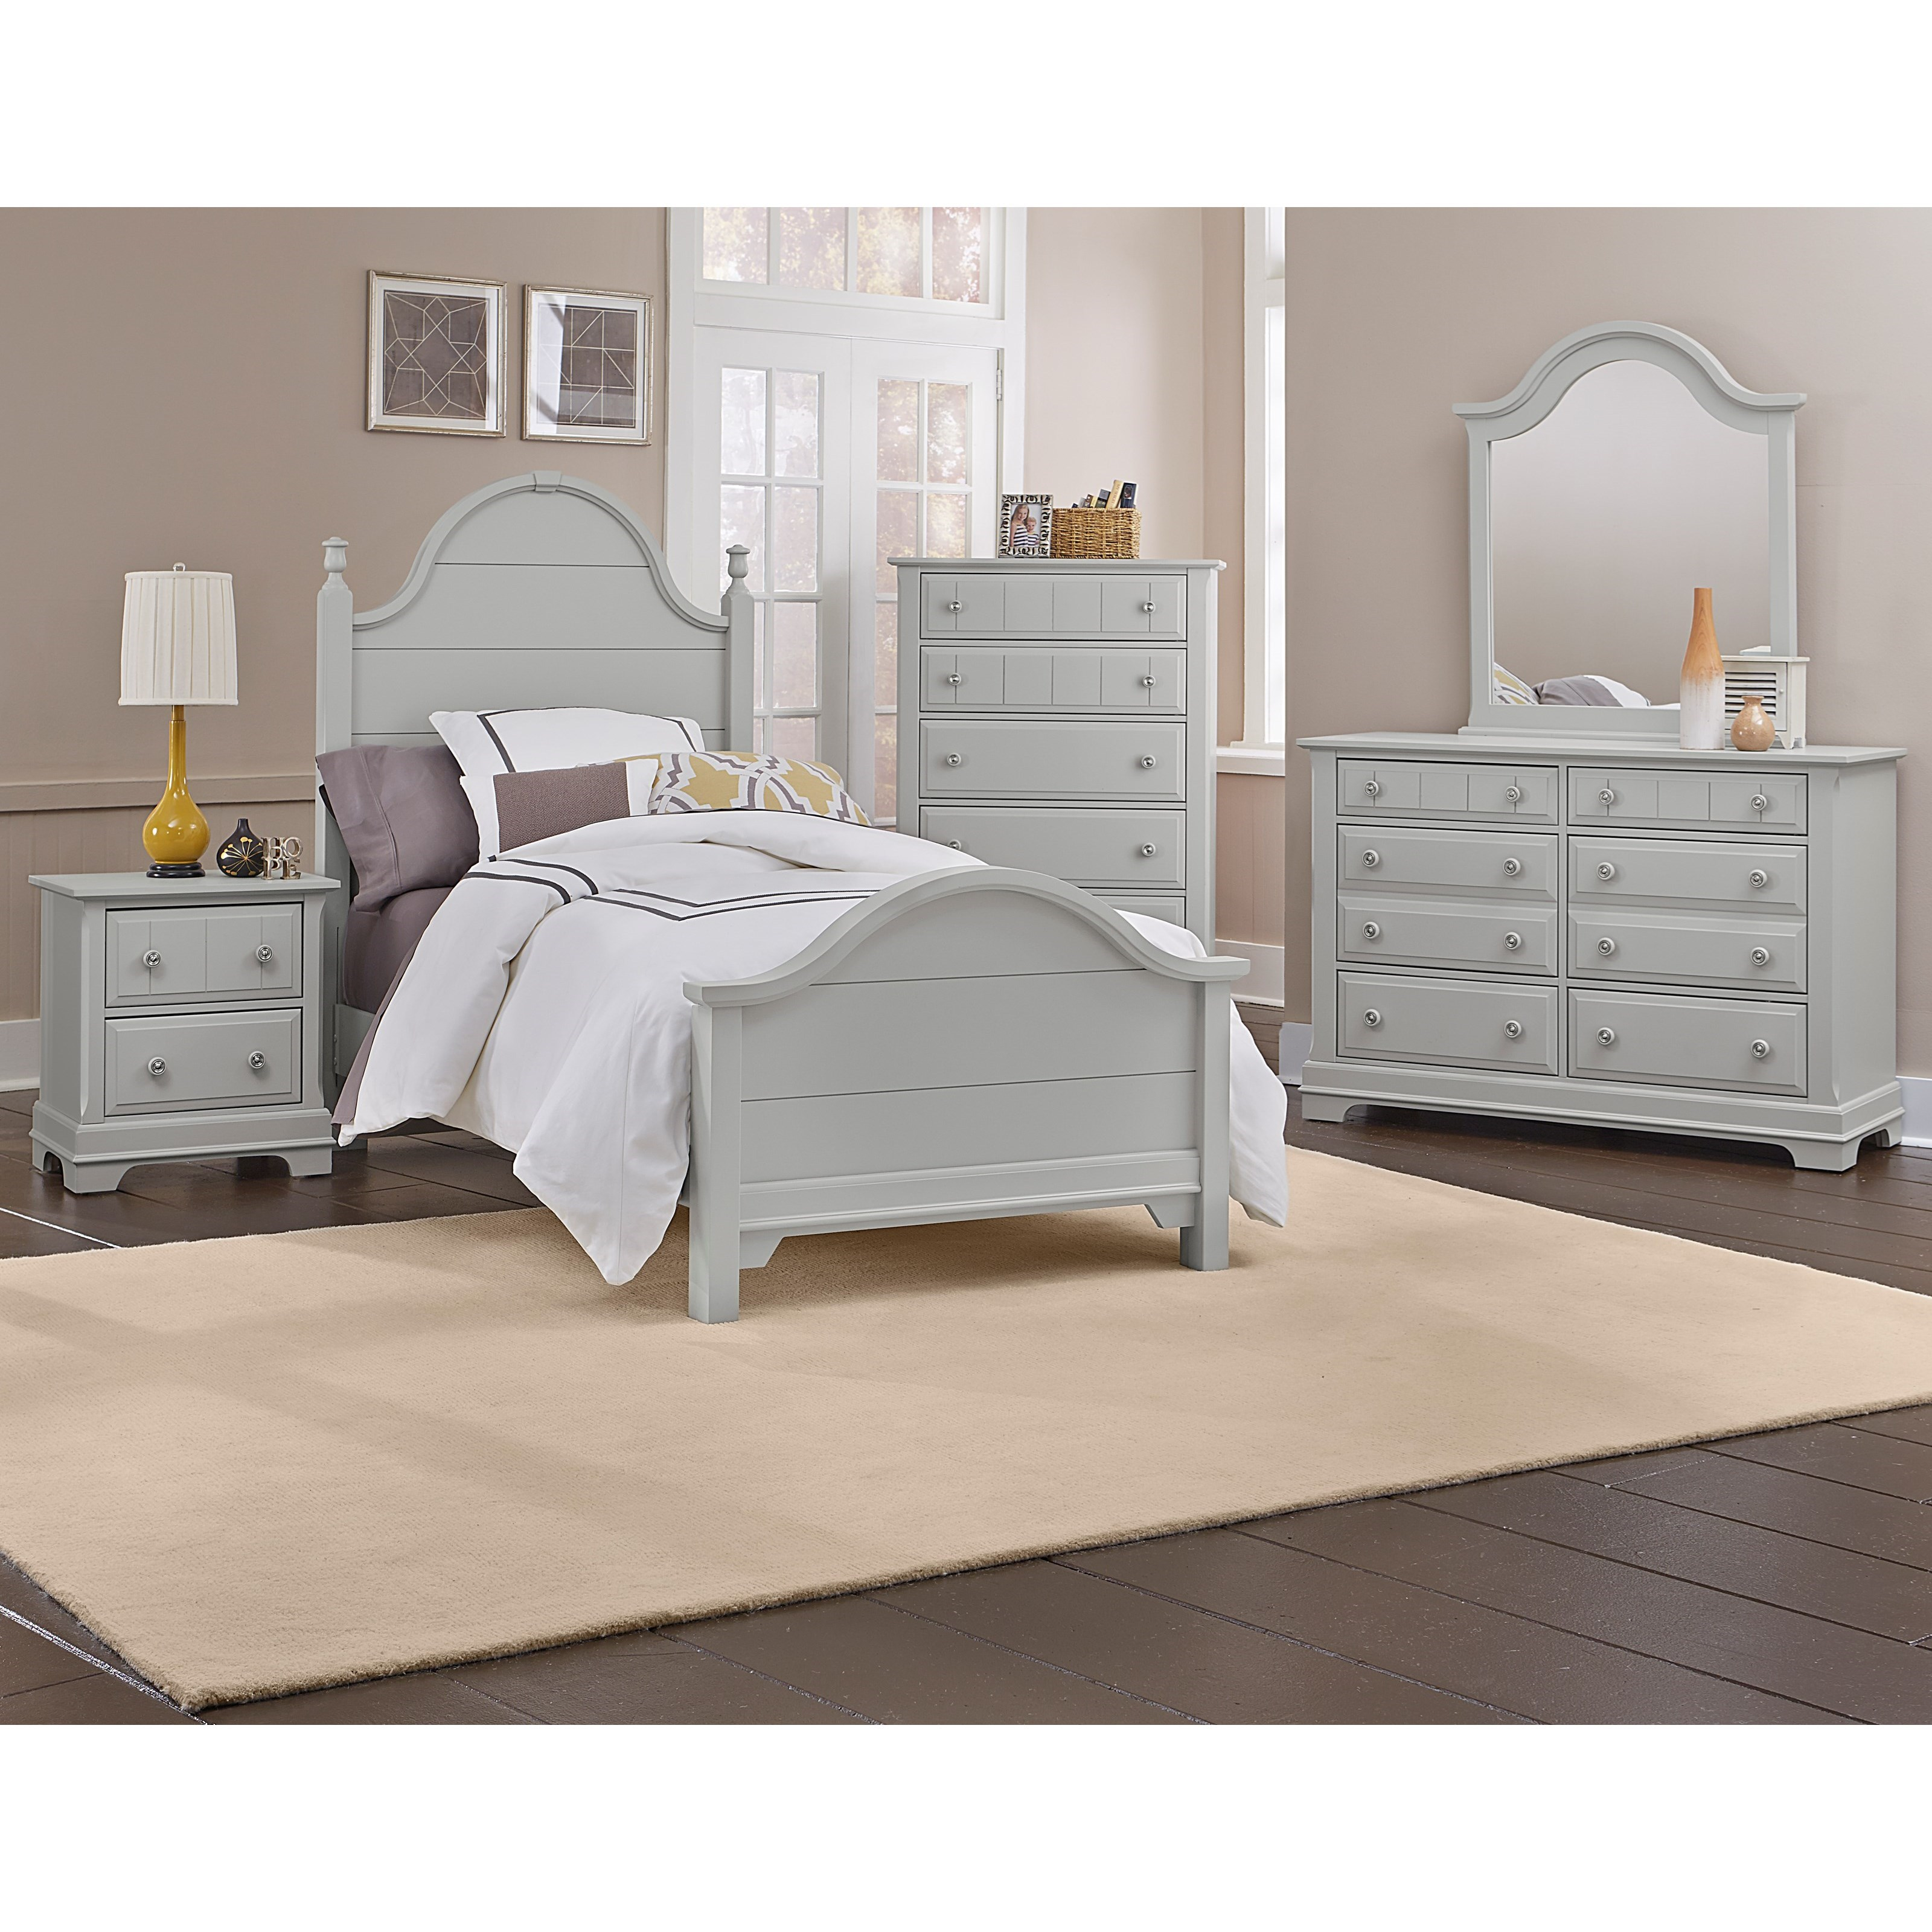 Vaughan bassett cottage king bedroom group dunk bright - Bright house bedroom furniture ...